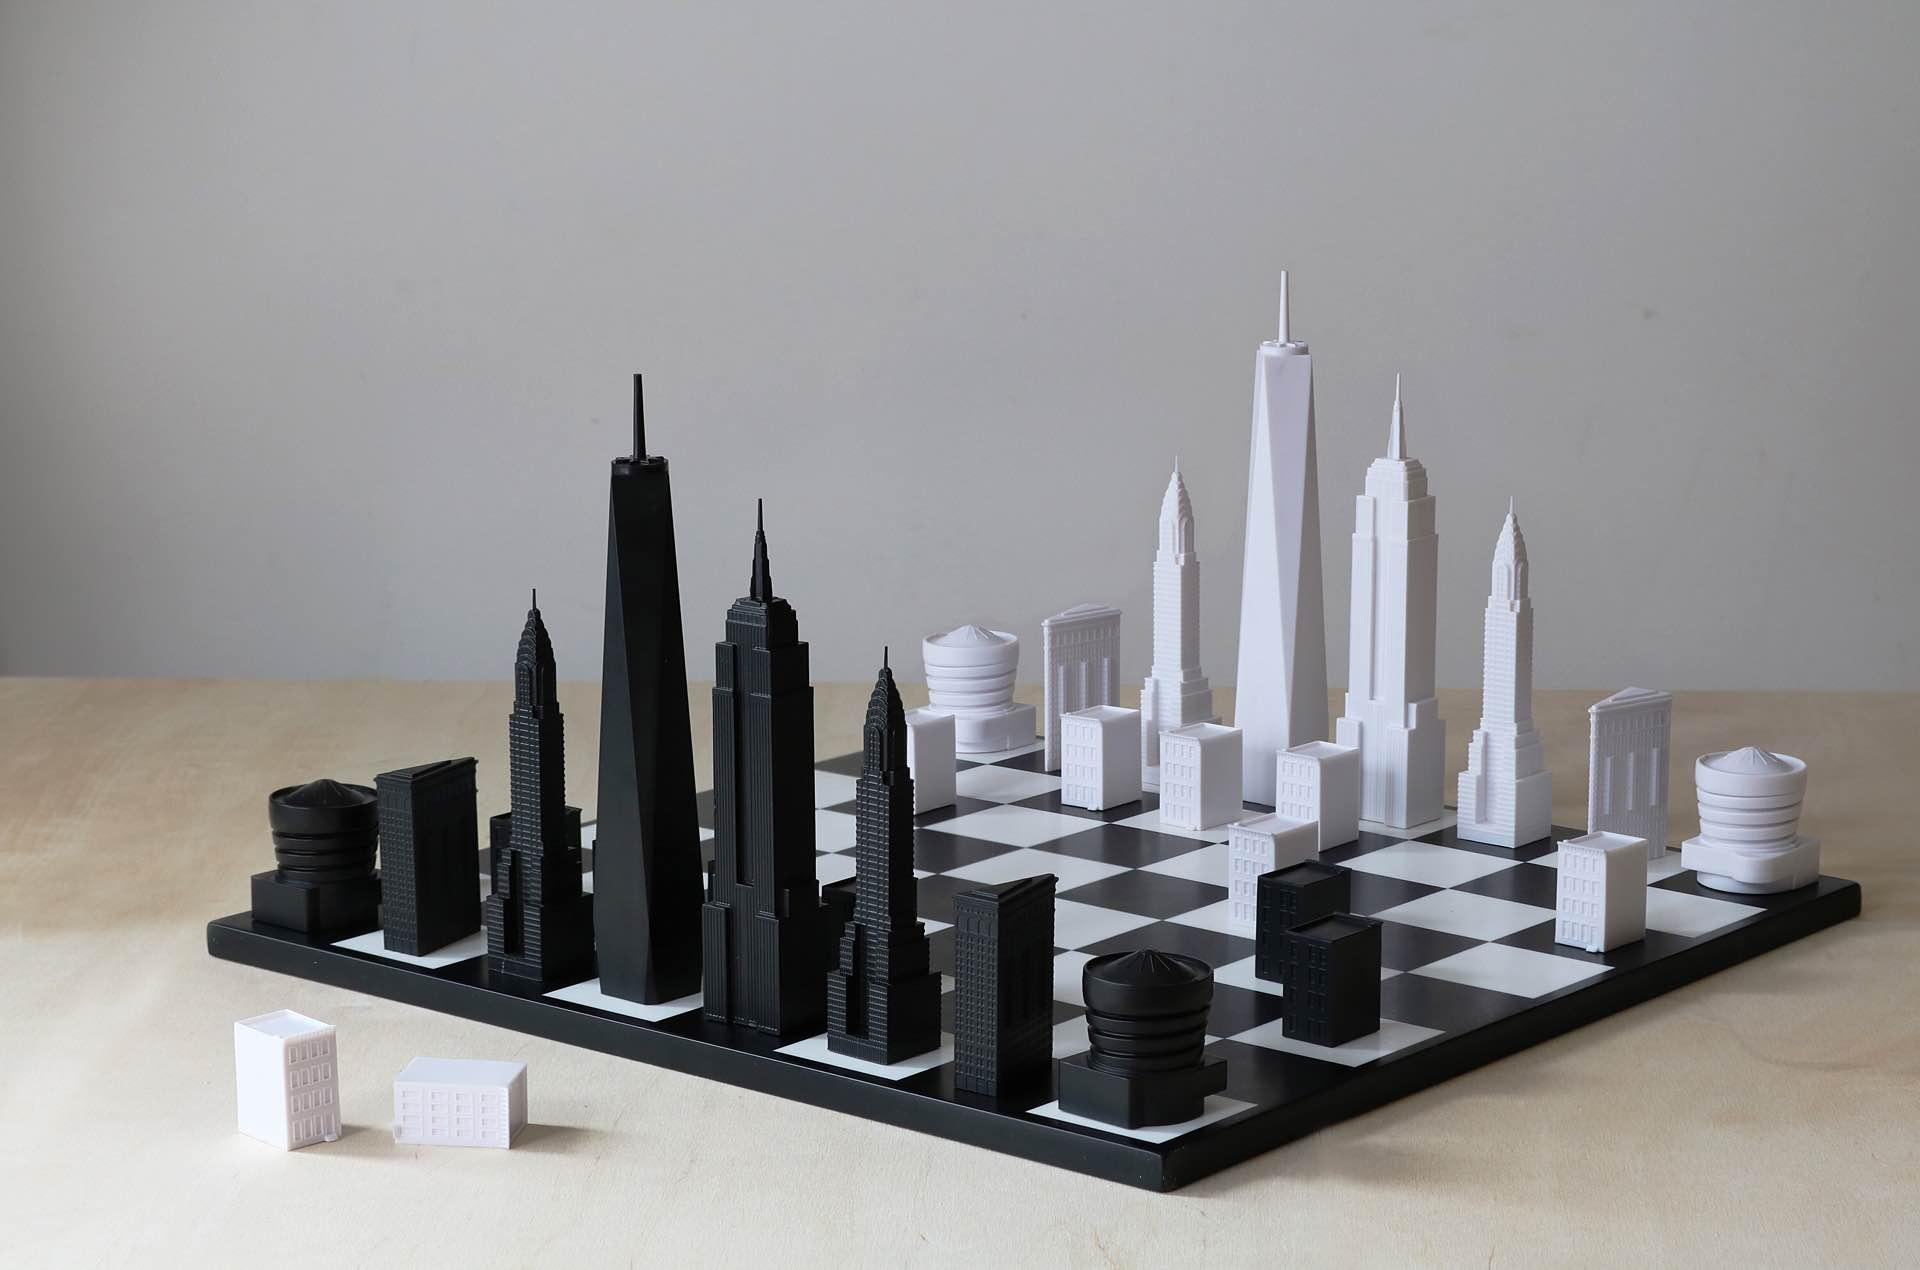 Skyline Chess chess sets. ($150 per city/set)